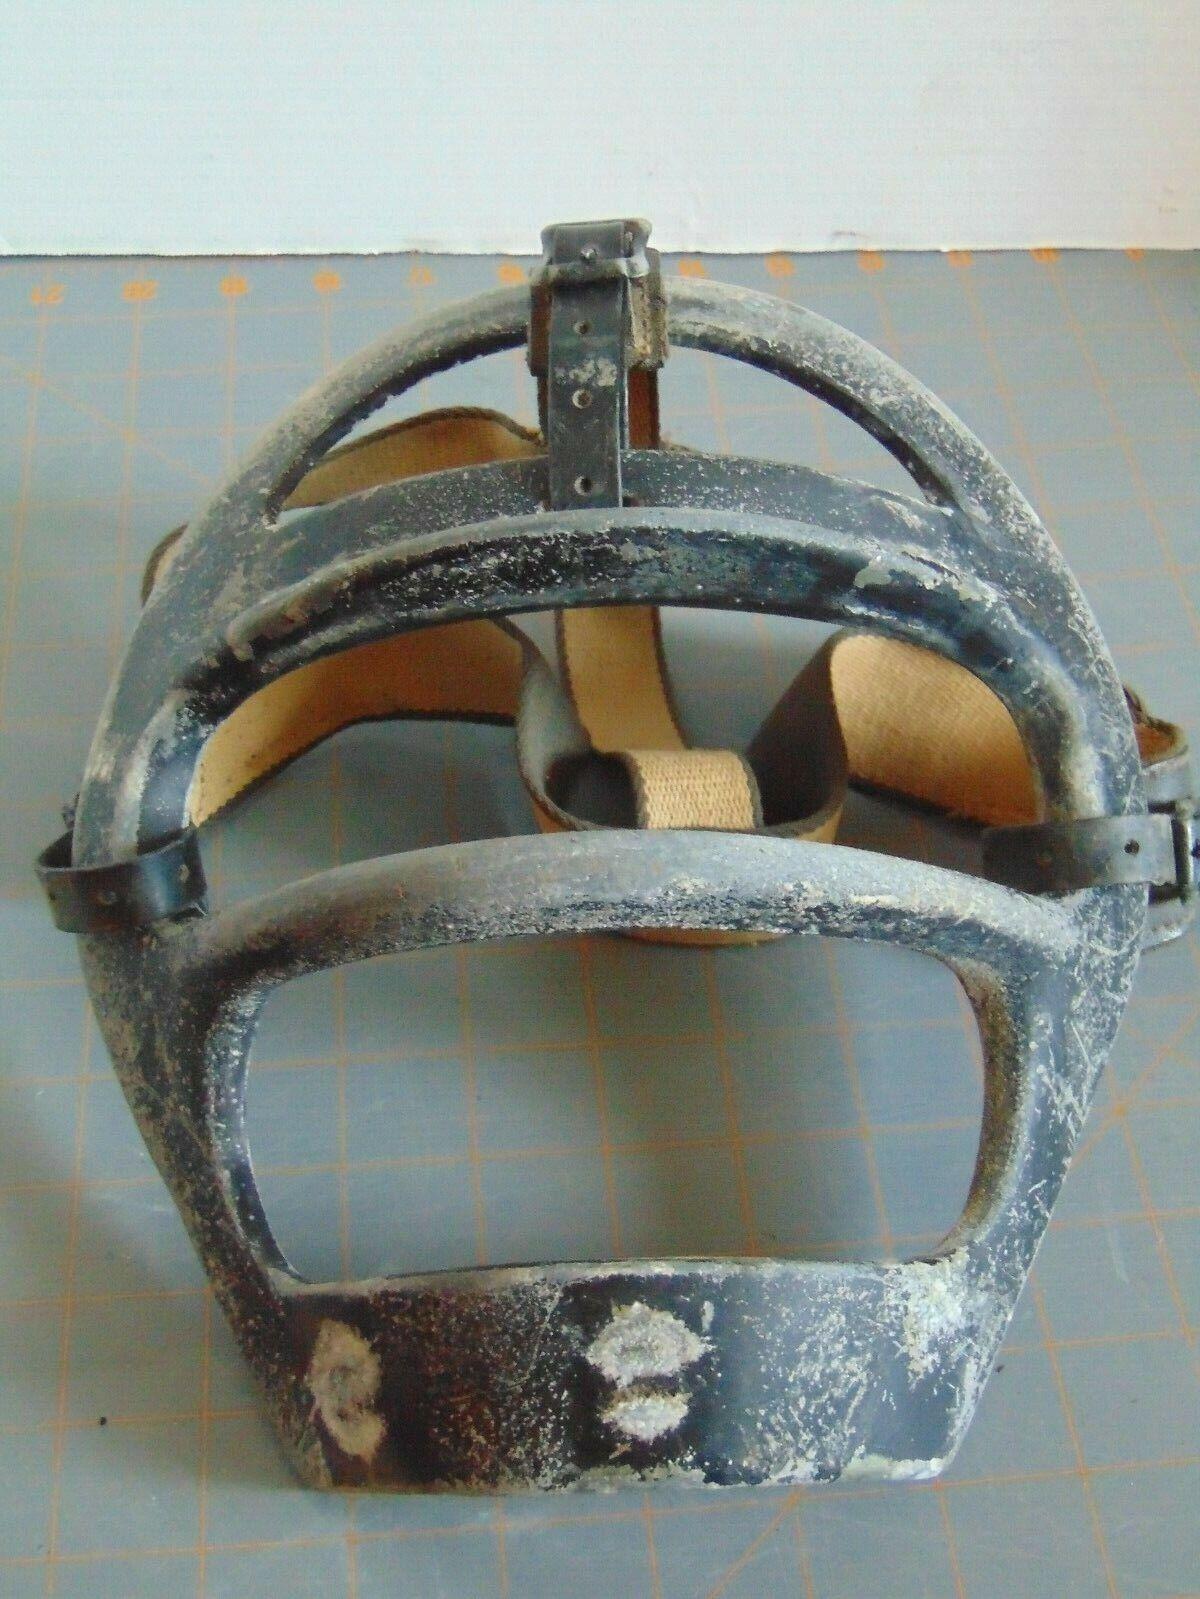 Vintage WILSON Metal Catcher's face mask